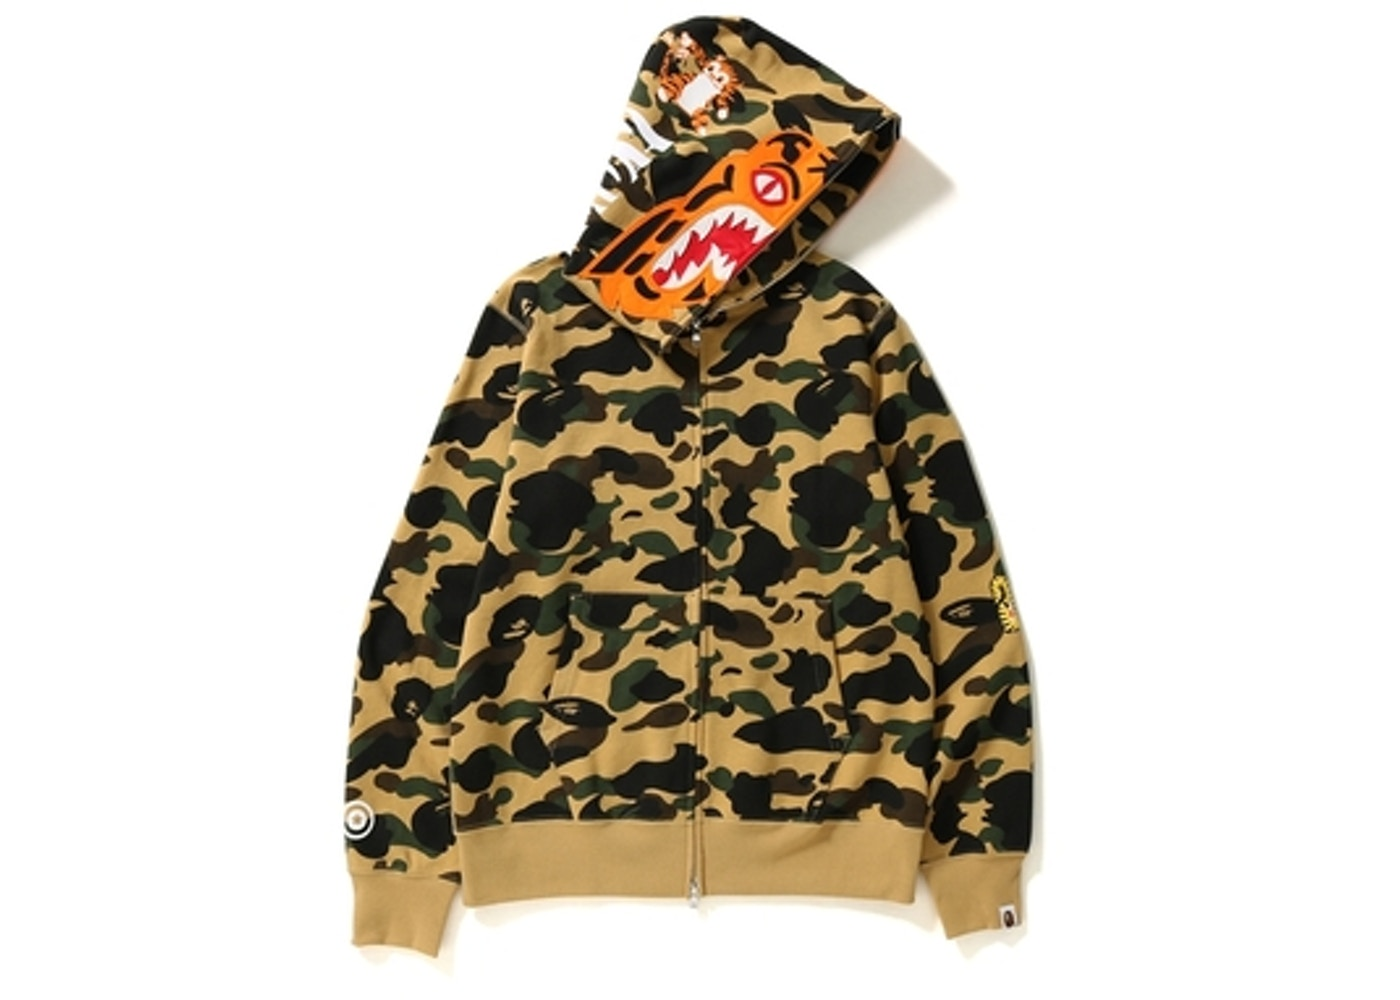 sale retailer 2bd6e 3eed4 BAPE 1st Camo Tiger Full Zip Hoodie Yellow